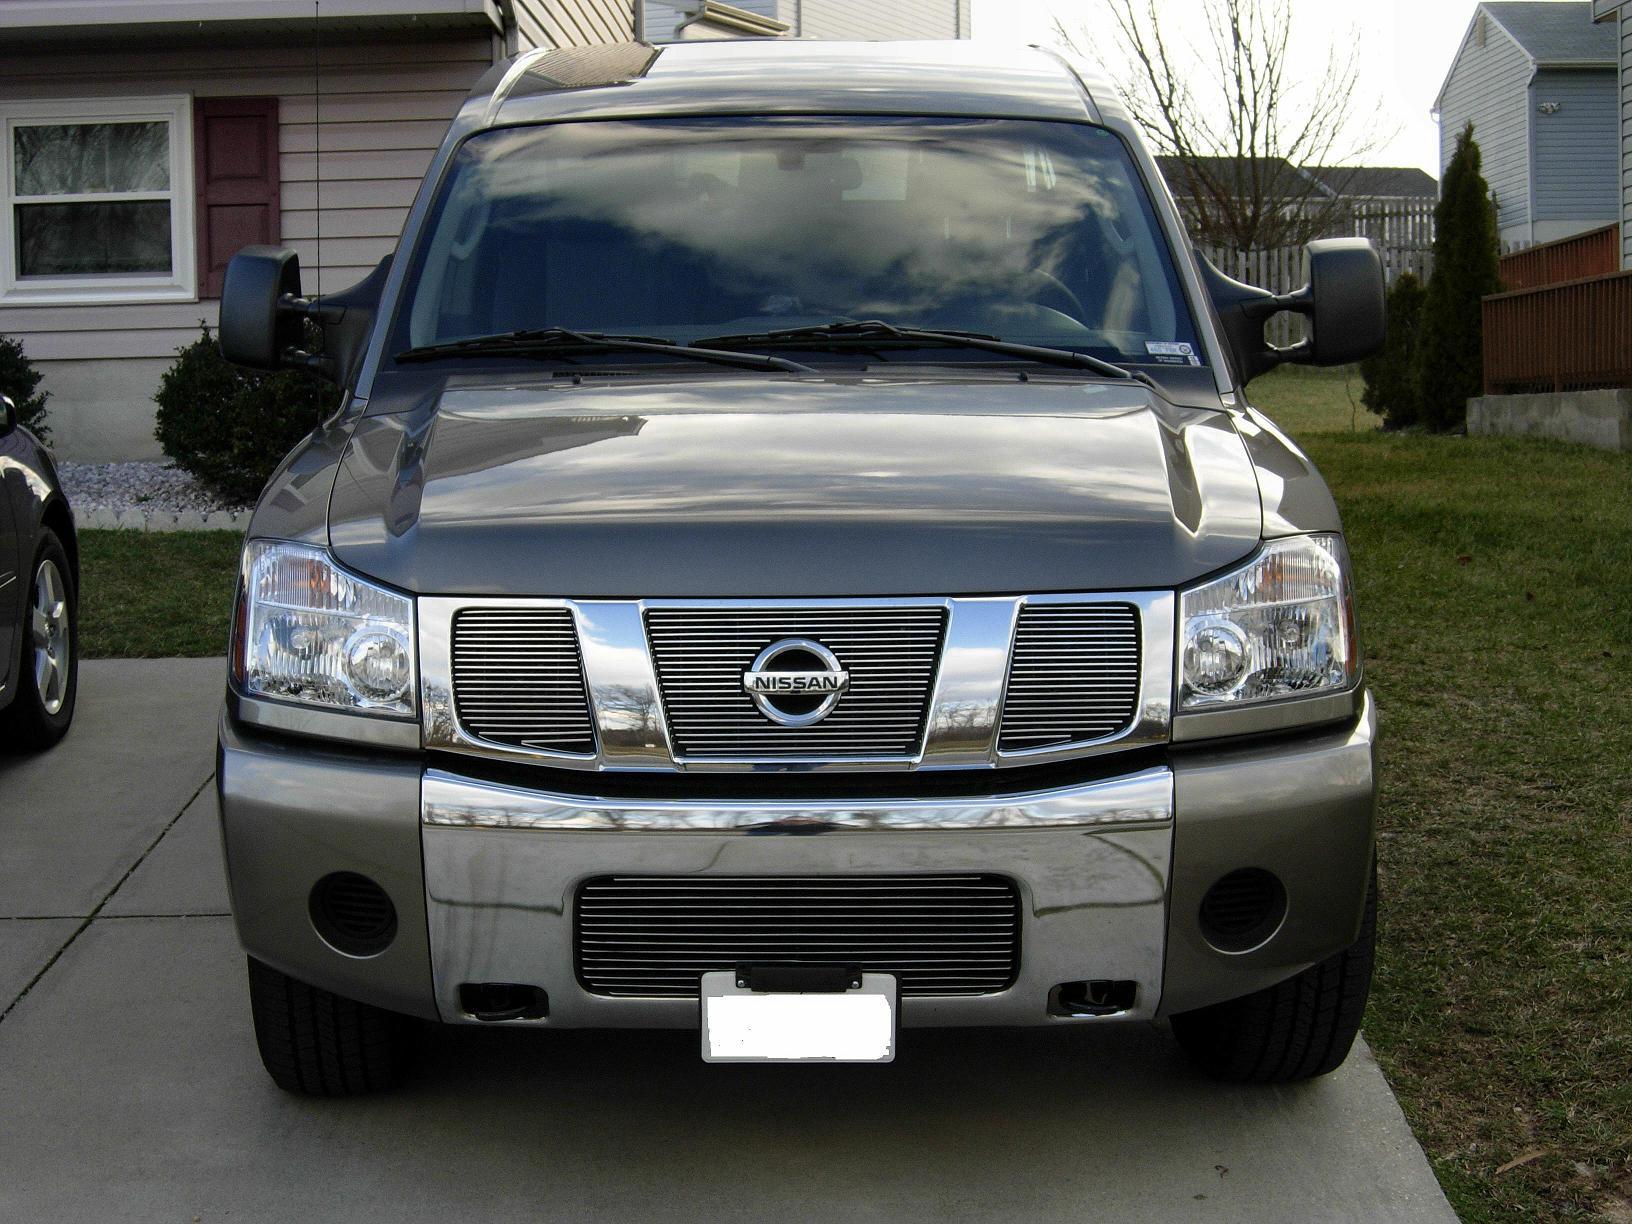 Nj License Plate Mounting Problem Nissan Titan Forum 2006 Xterra Fuse Diagram Frontplate